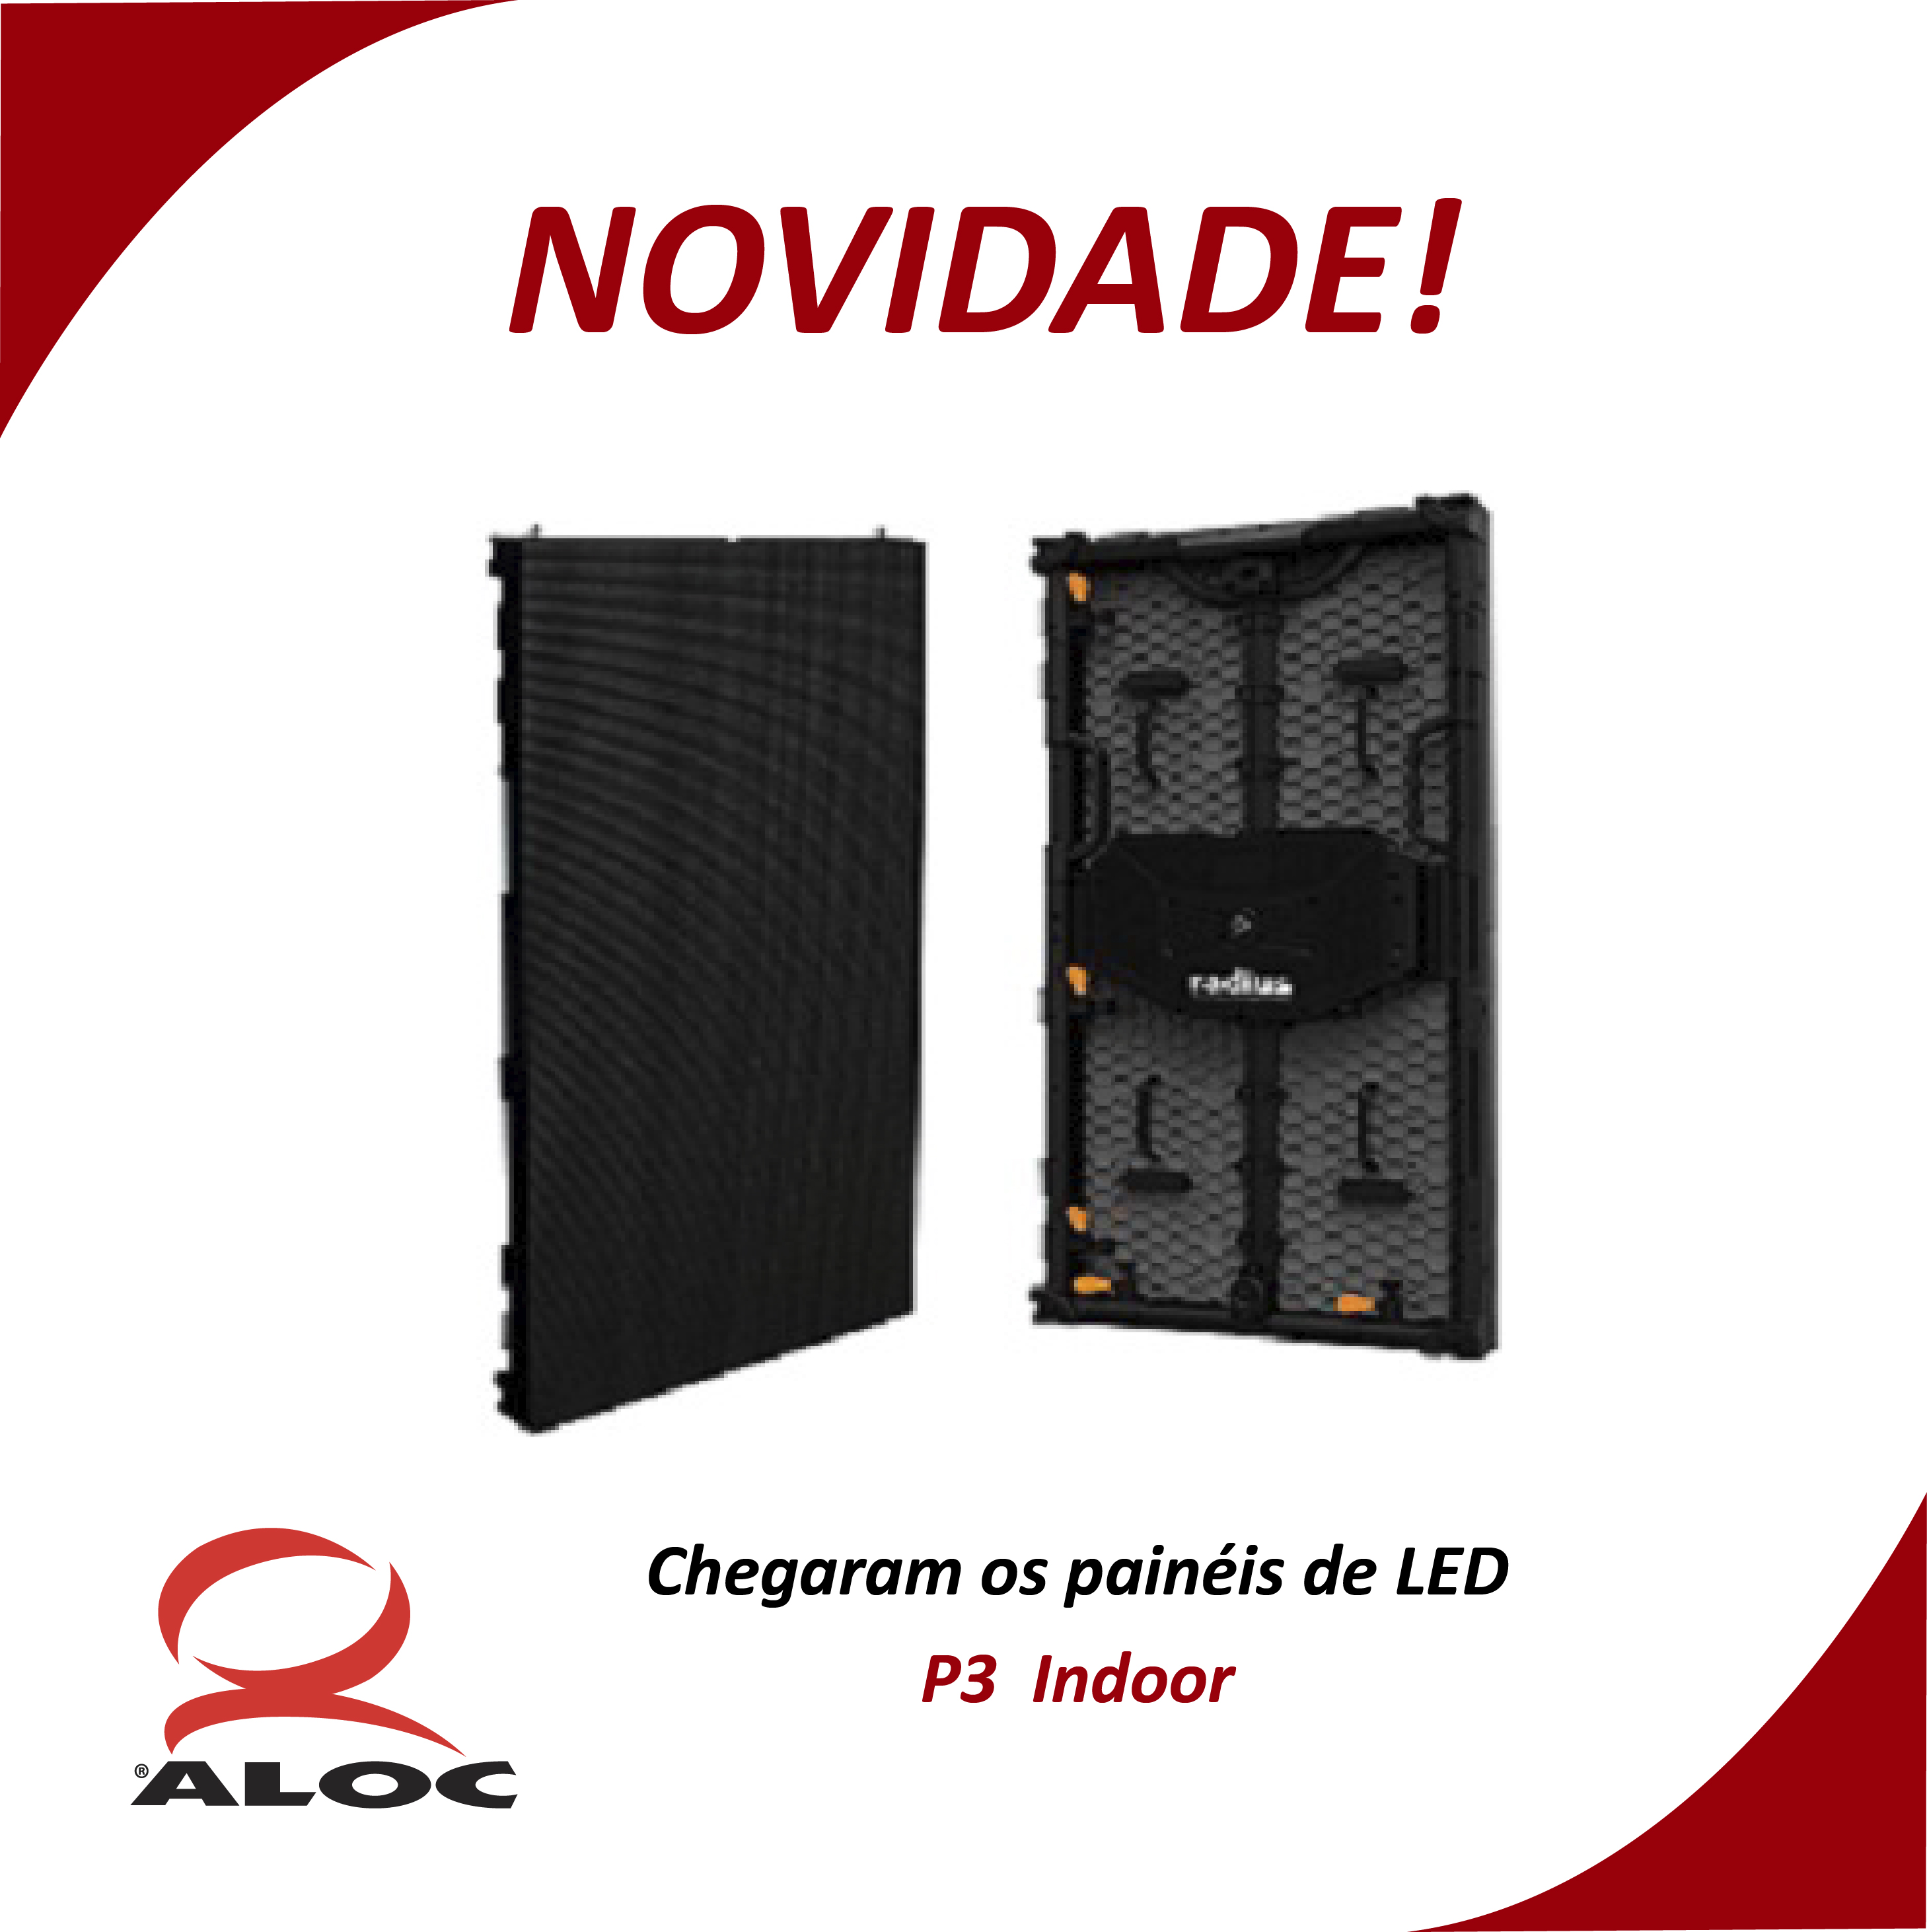 Painel de LED P3 Indoor